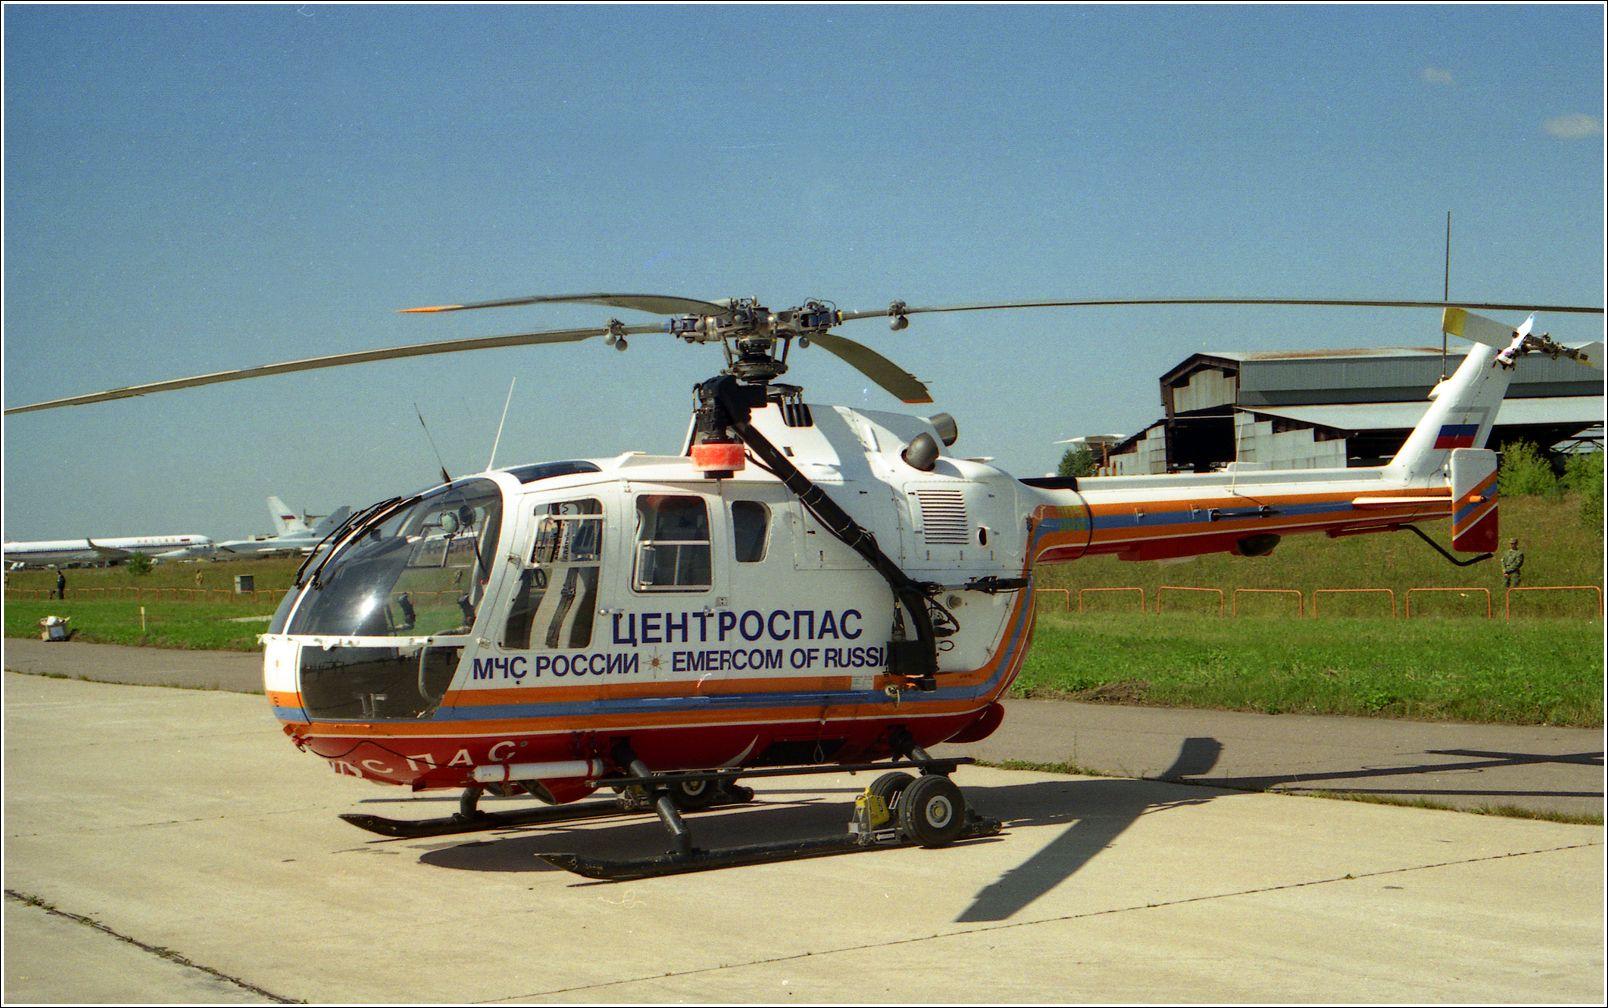 BO-105 (1998 г.) BO-105 БО-105 авиация вертолет стоянка Жуковский 1998